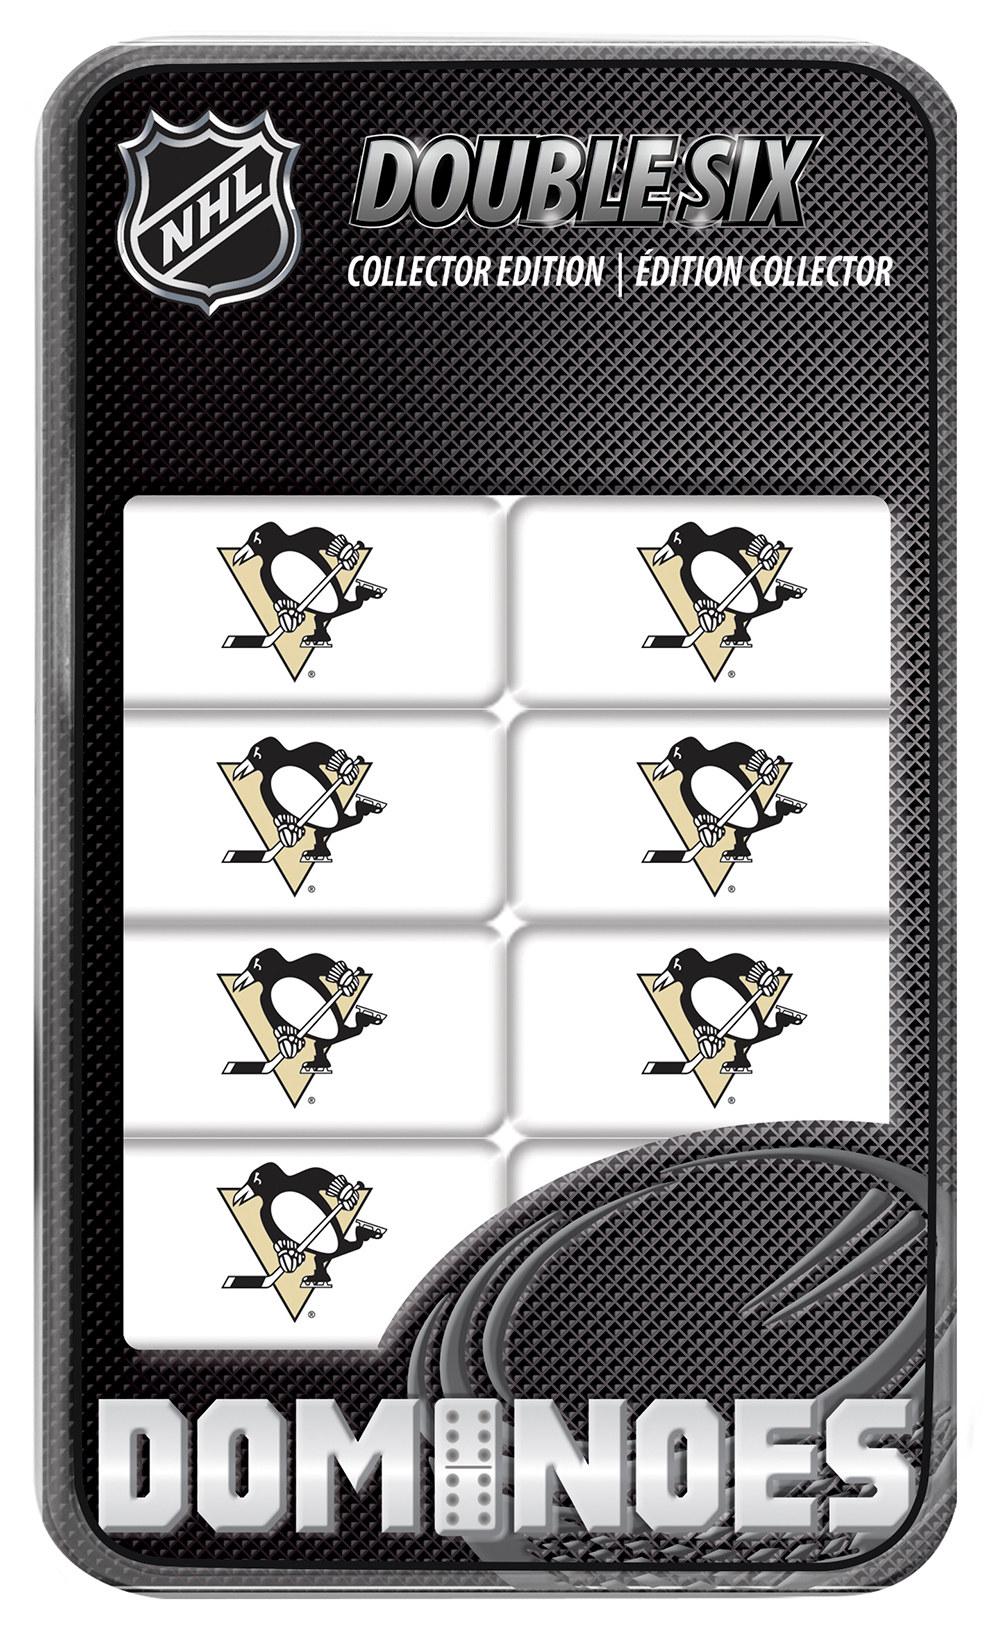 Pittsburgh Penguins Dominoes